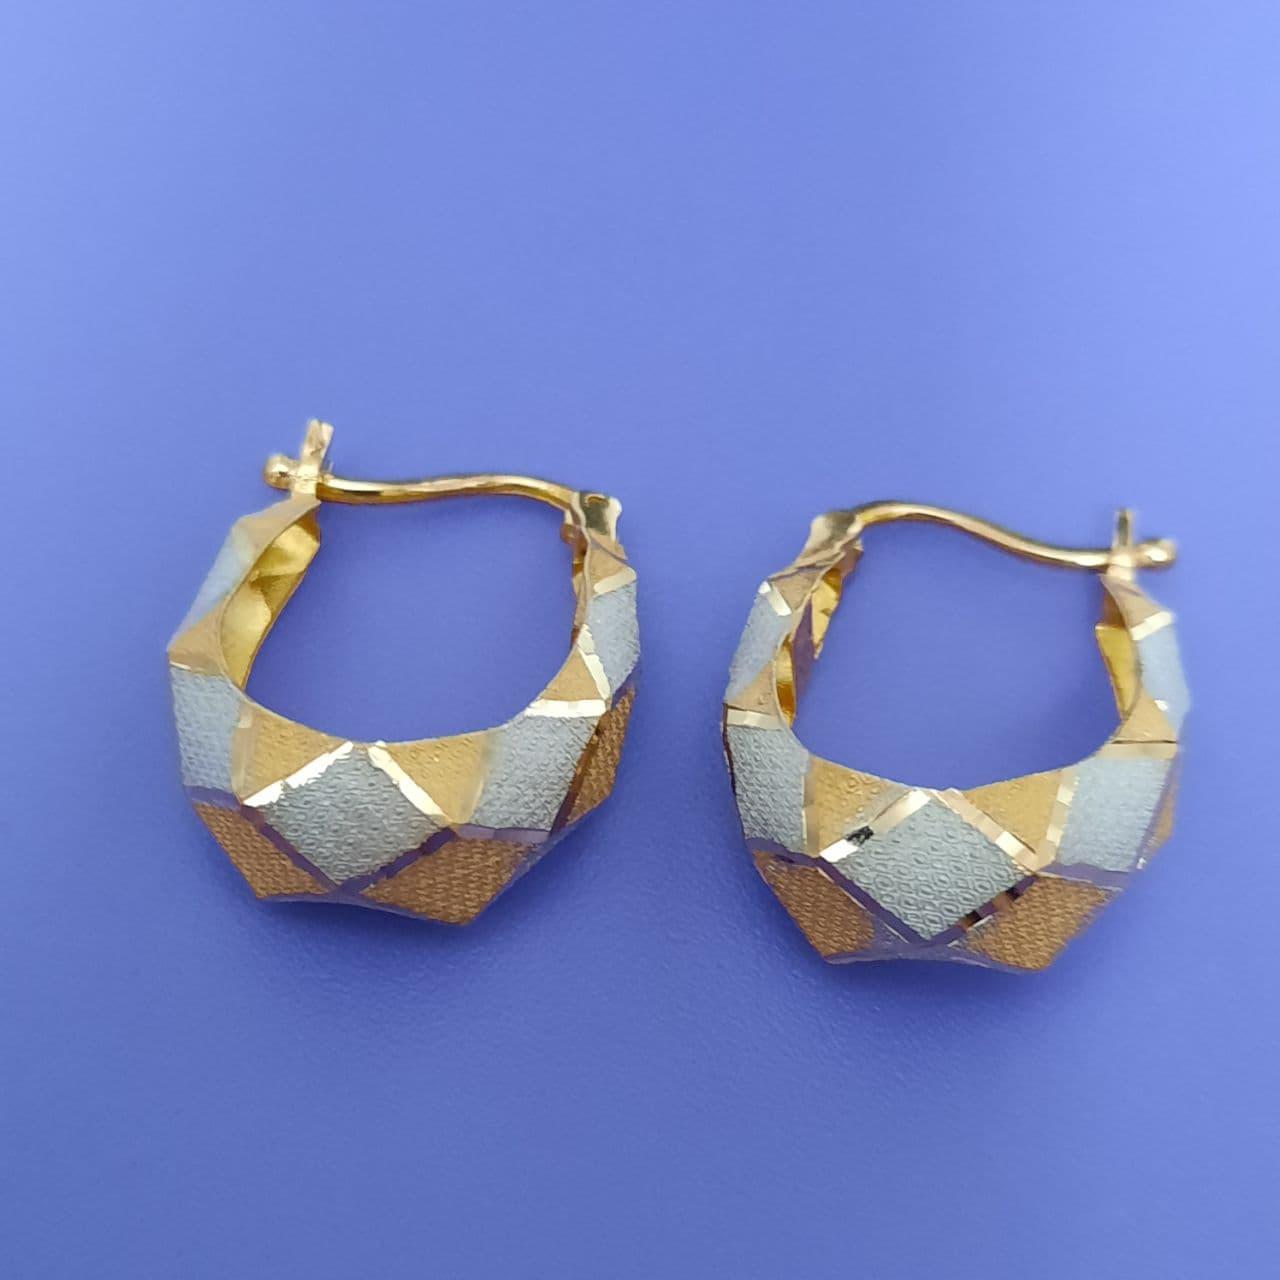 گوشواره طلا 18 عیار زنانه  گالری یارطلا کد AGF30